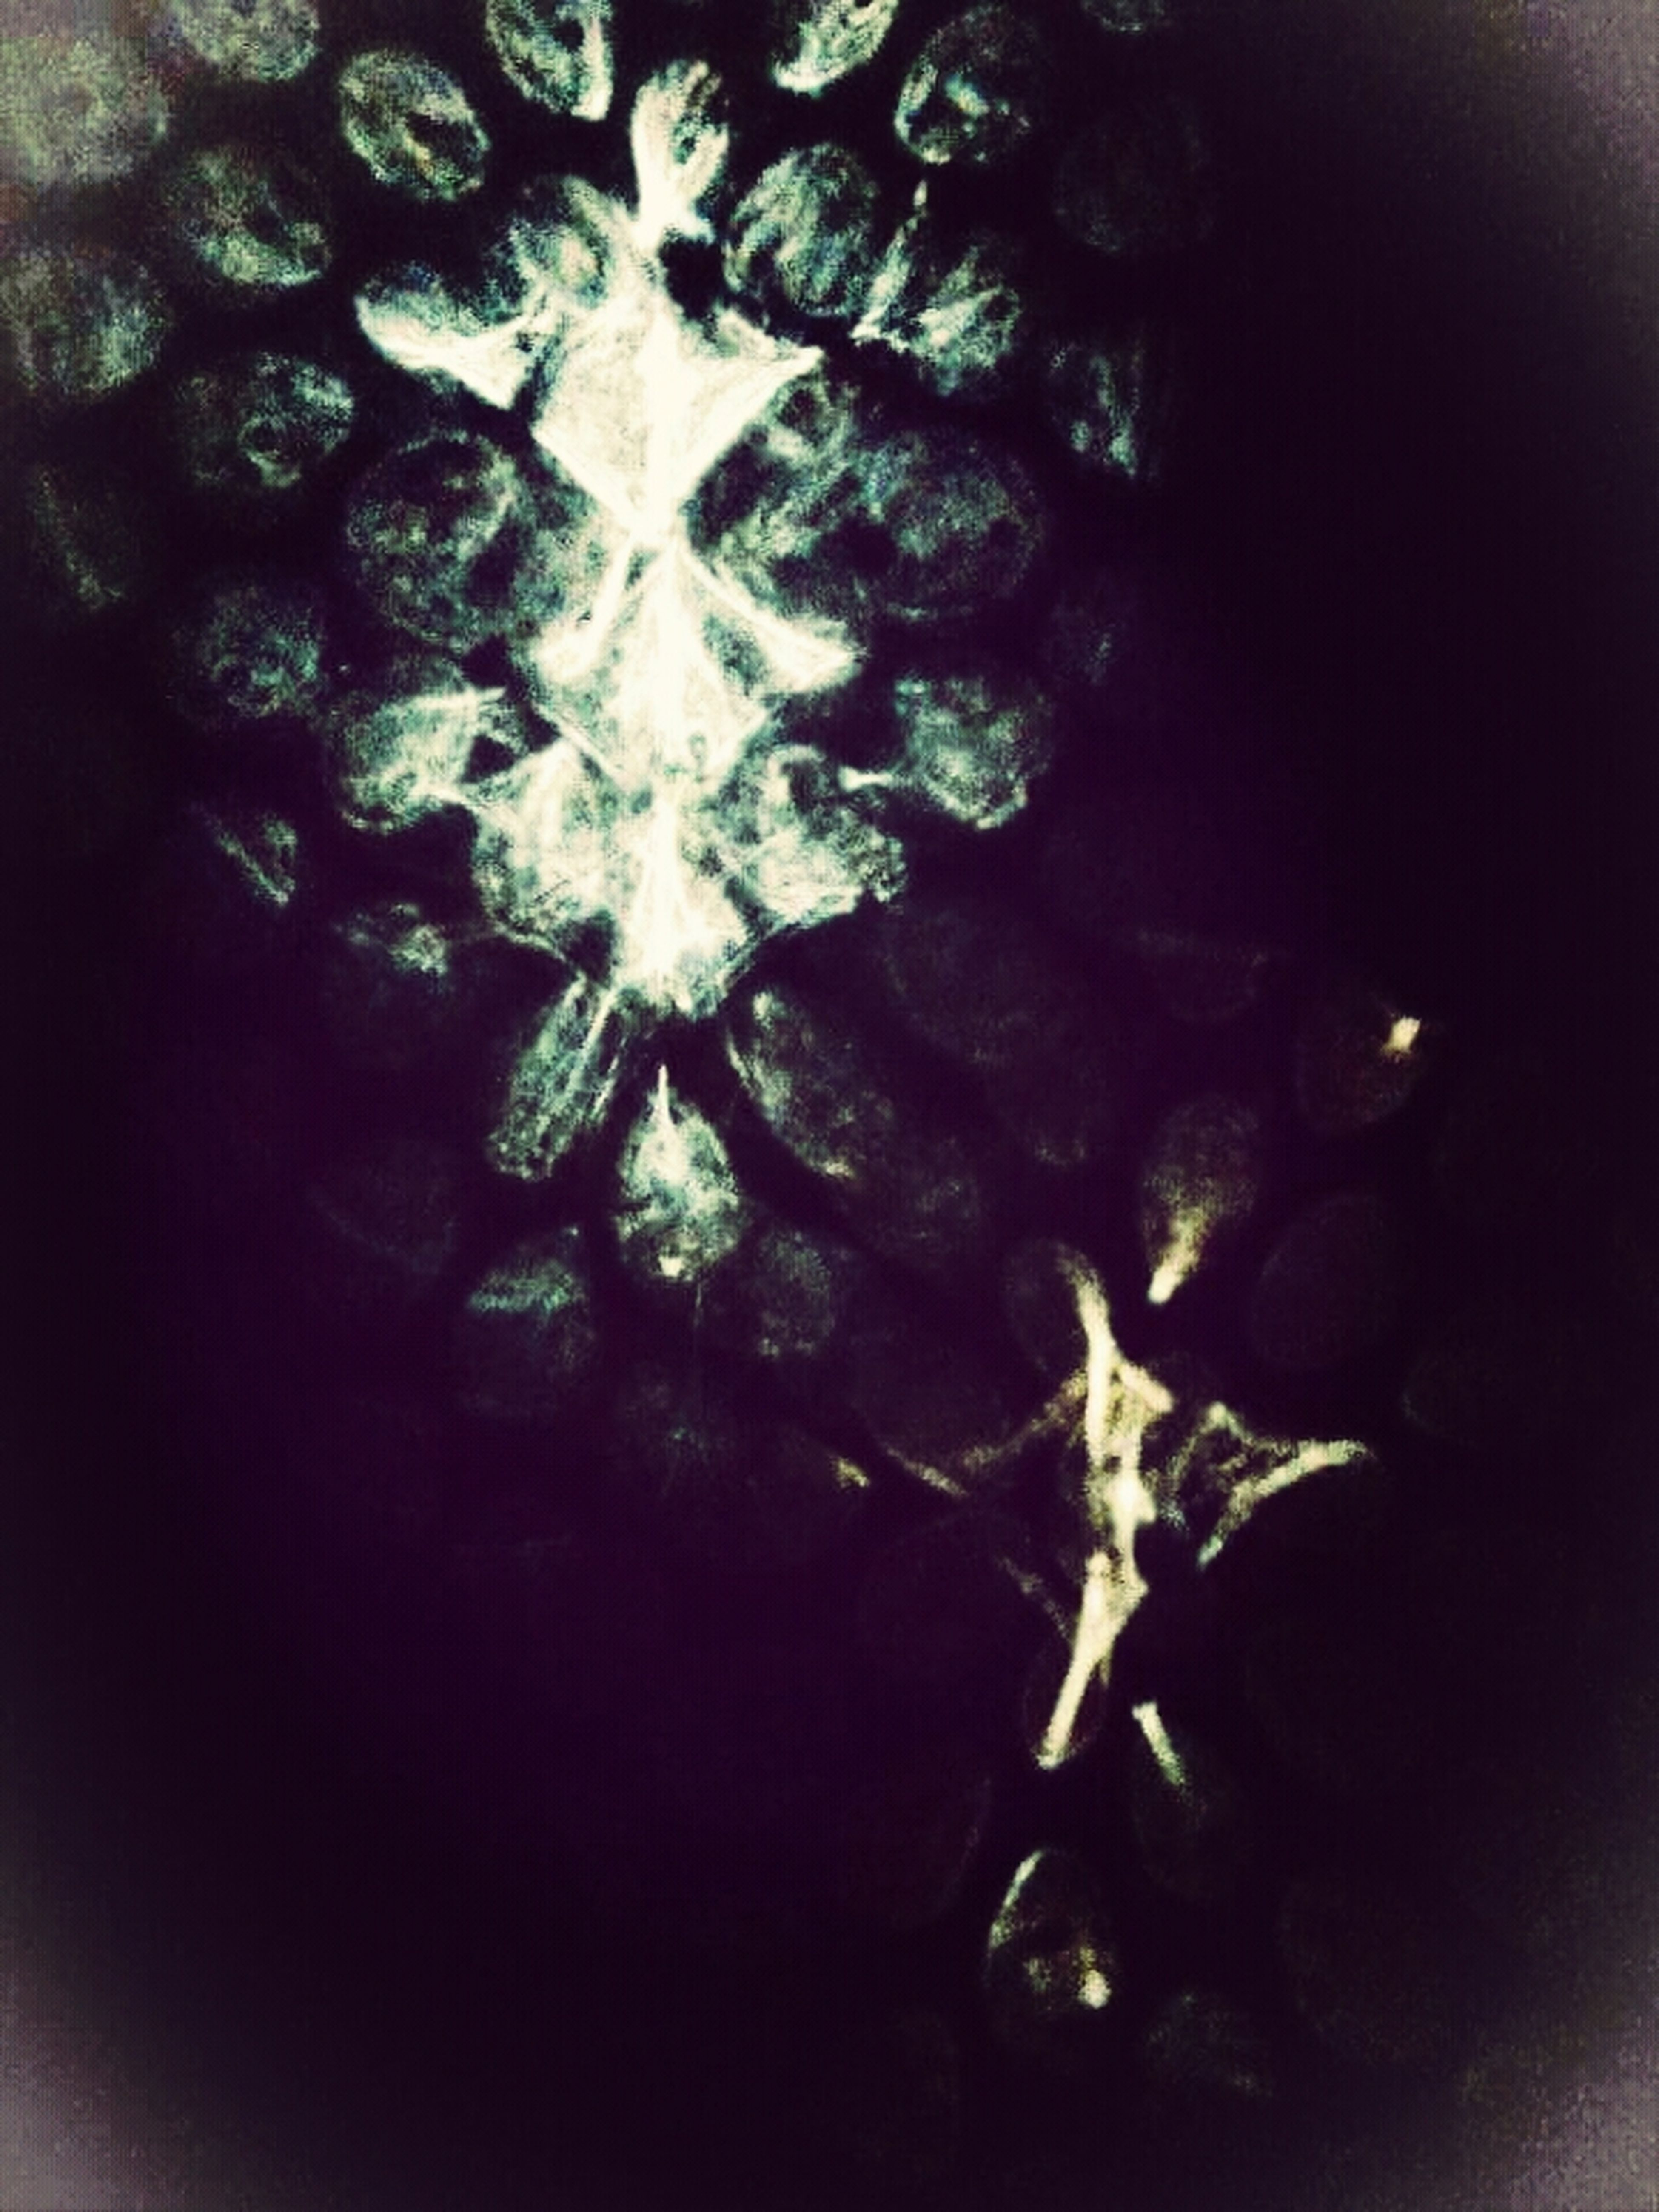 Photography Glasseffect Lighting Geometric Art Monochrome Me And My Camera Philippines